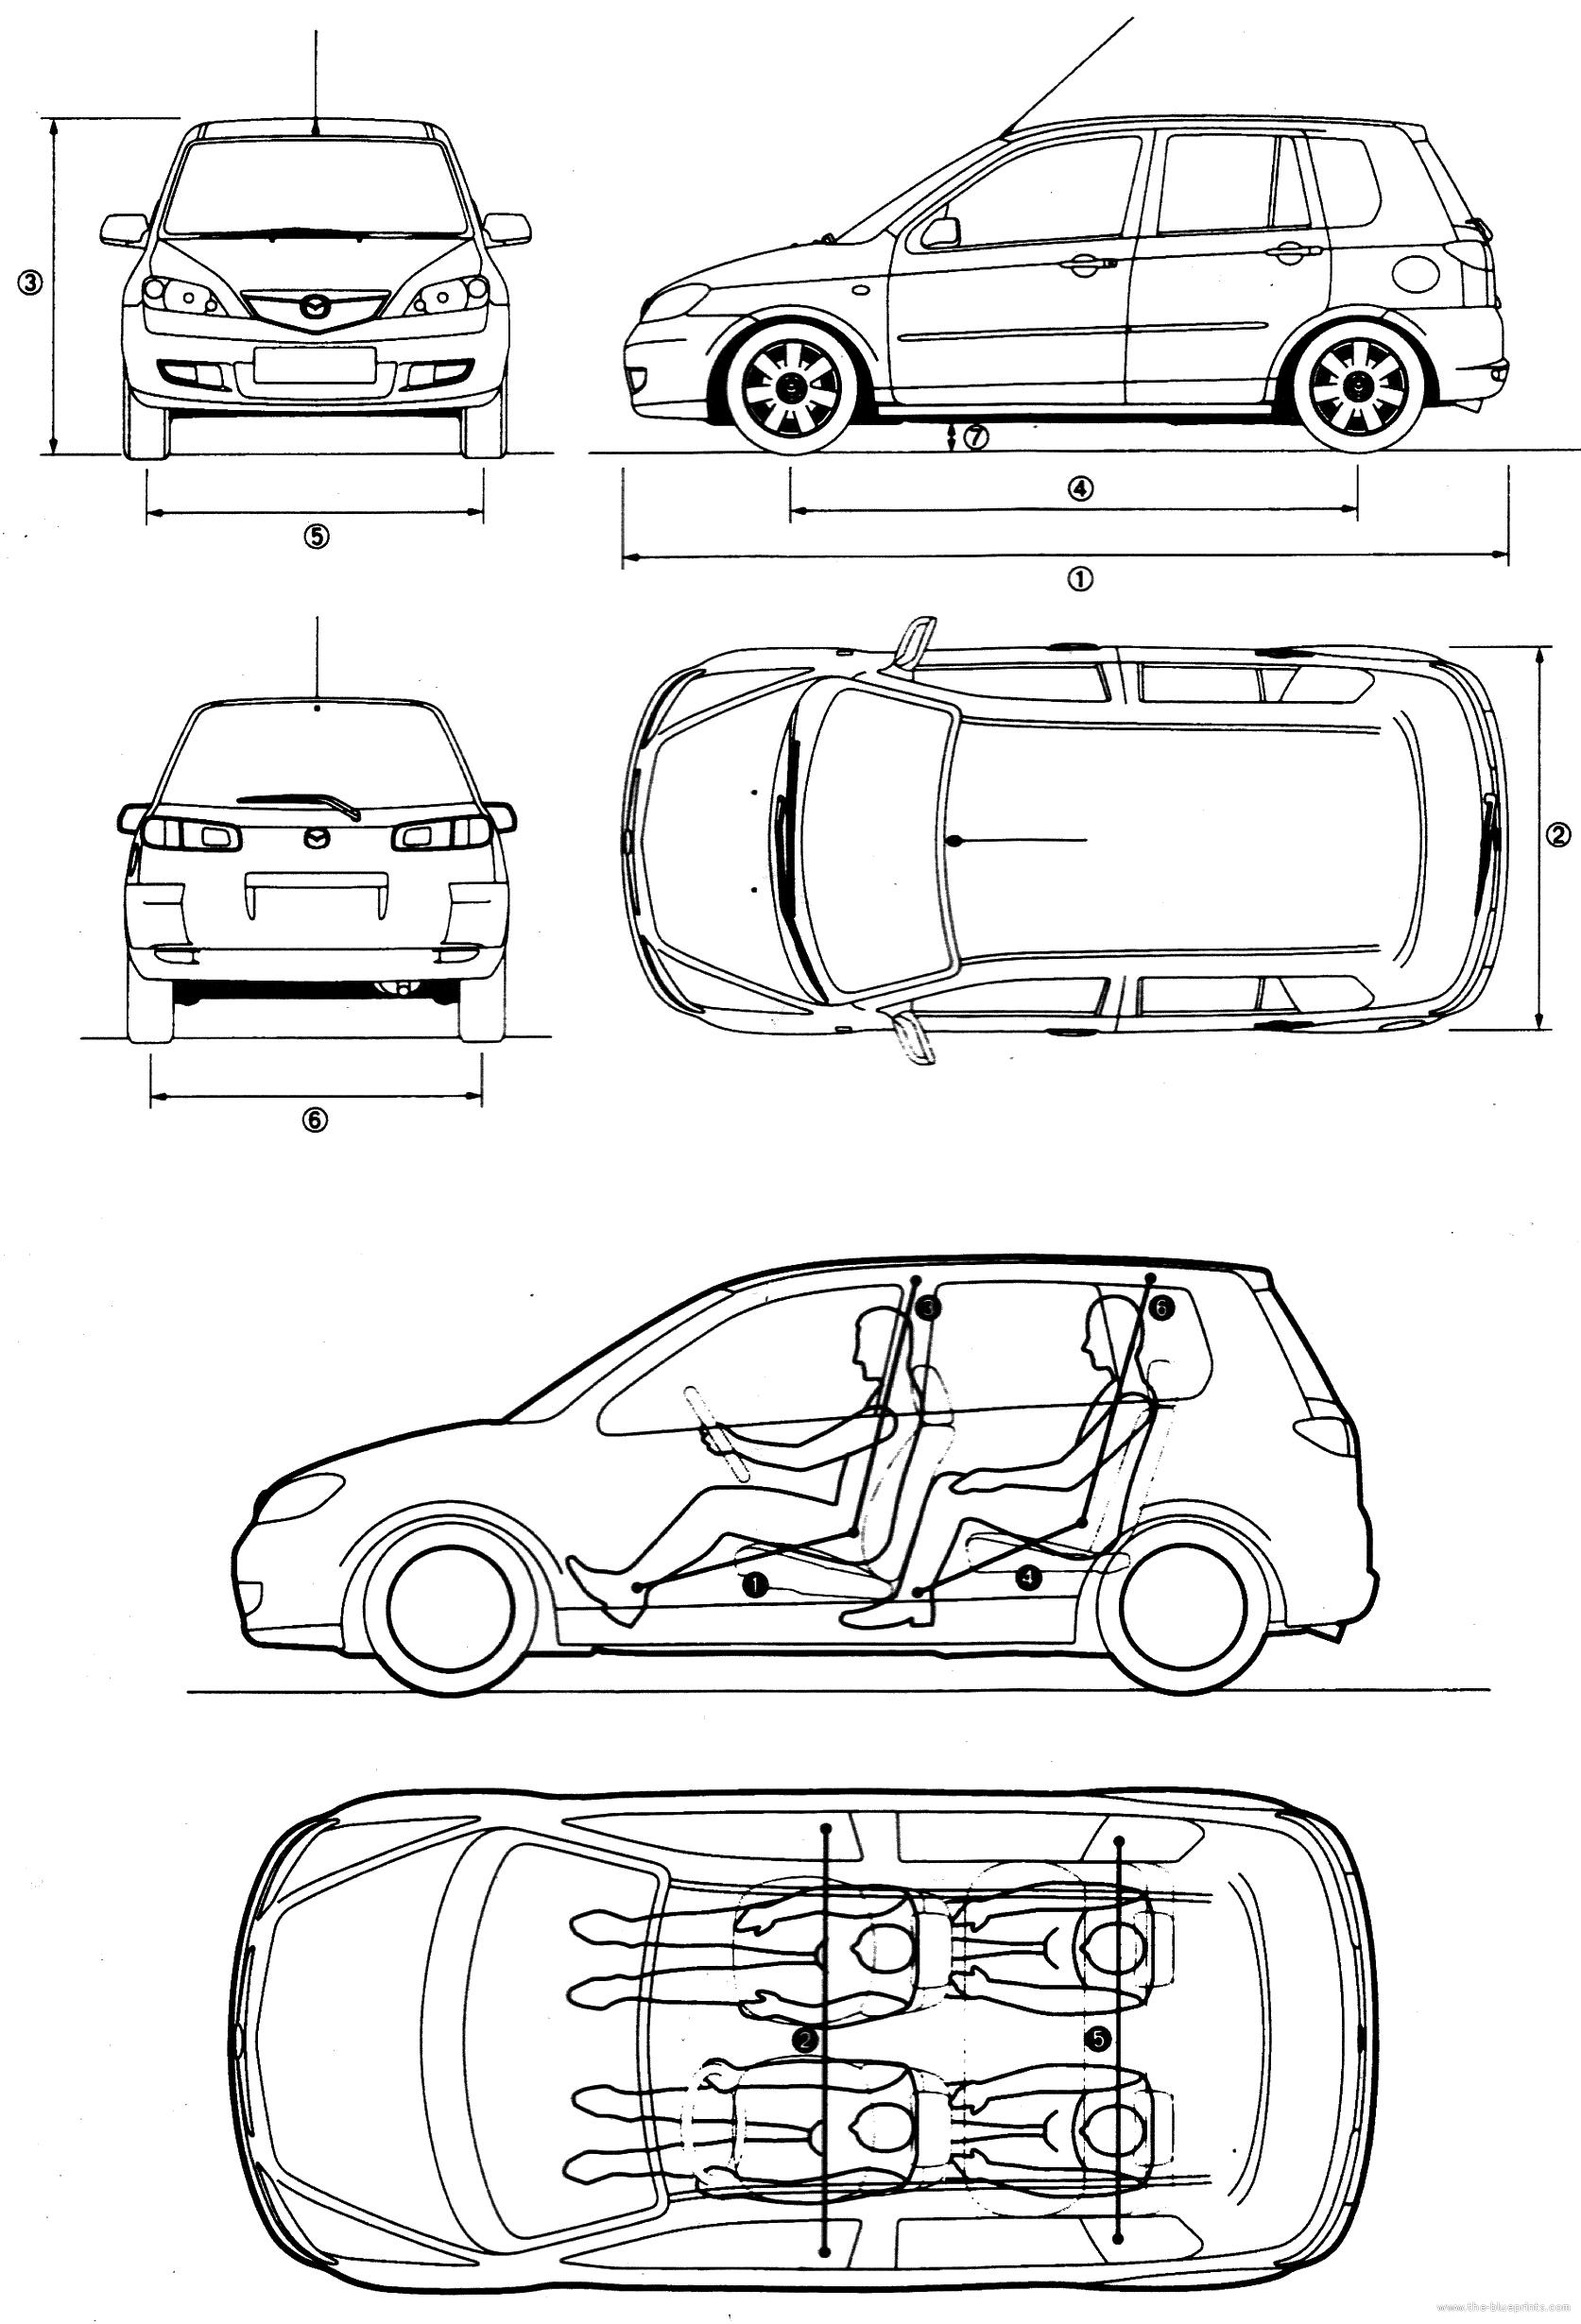 blueprints  u0026gt  cars  u0026gt  mazda  u0026gt  mazda 2 5